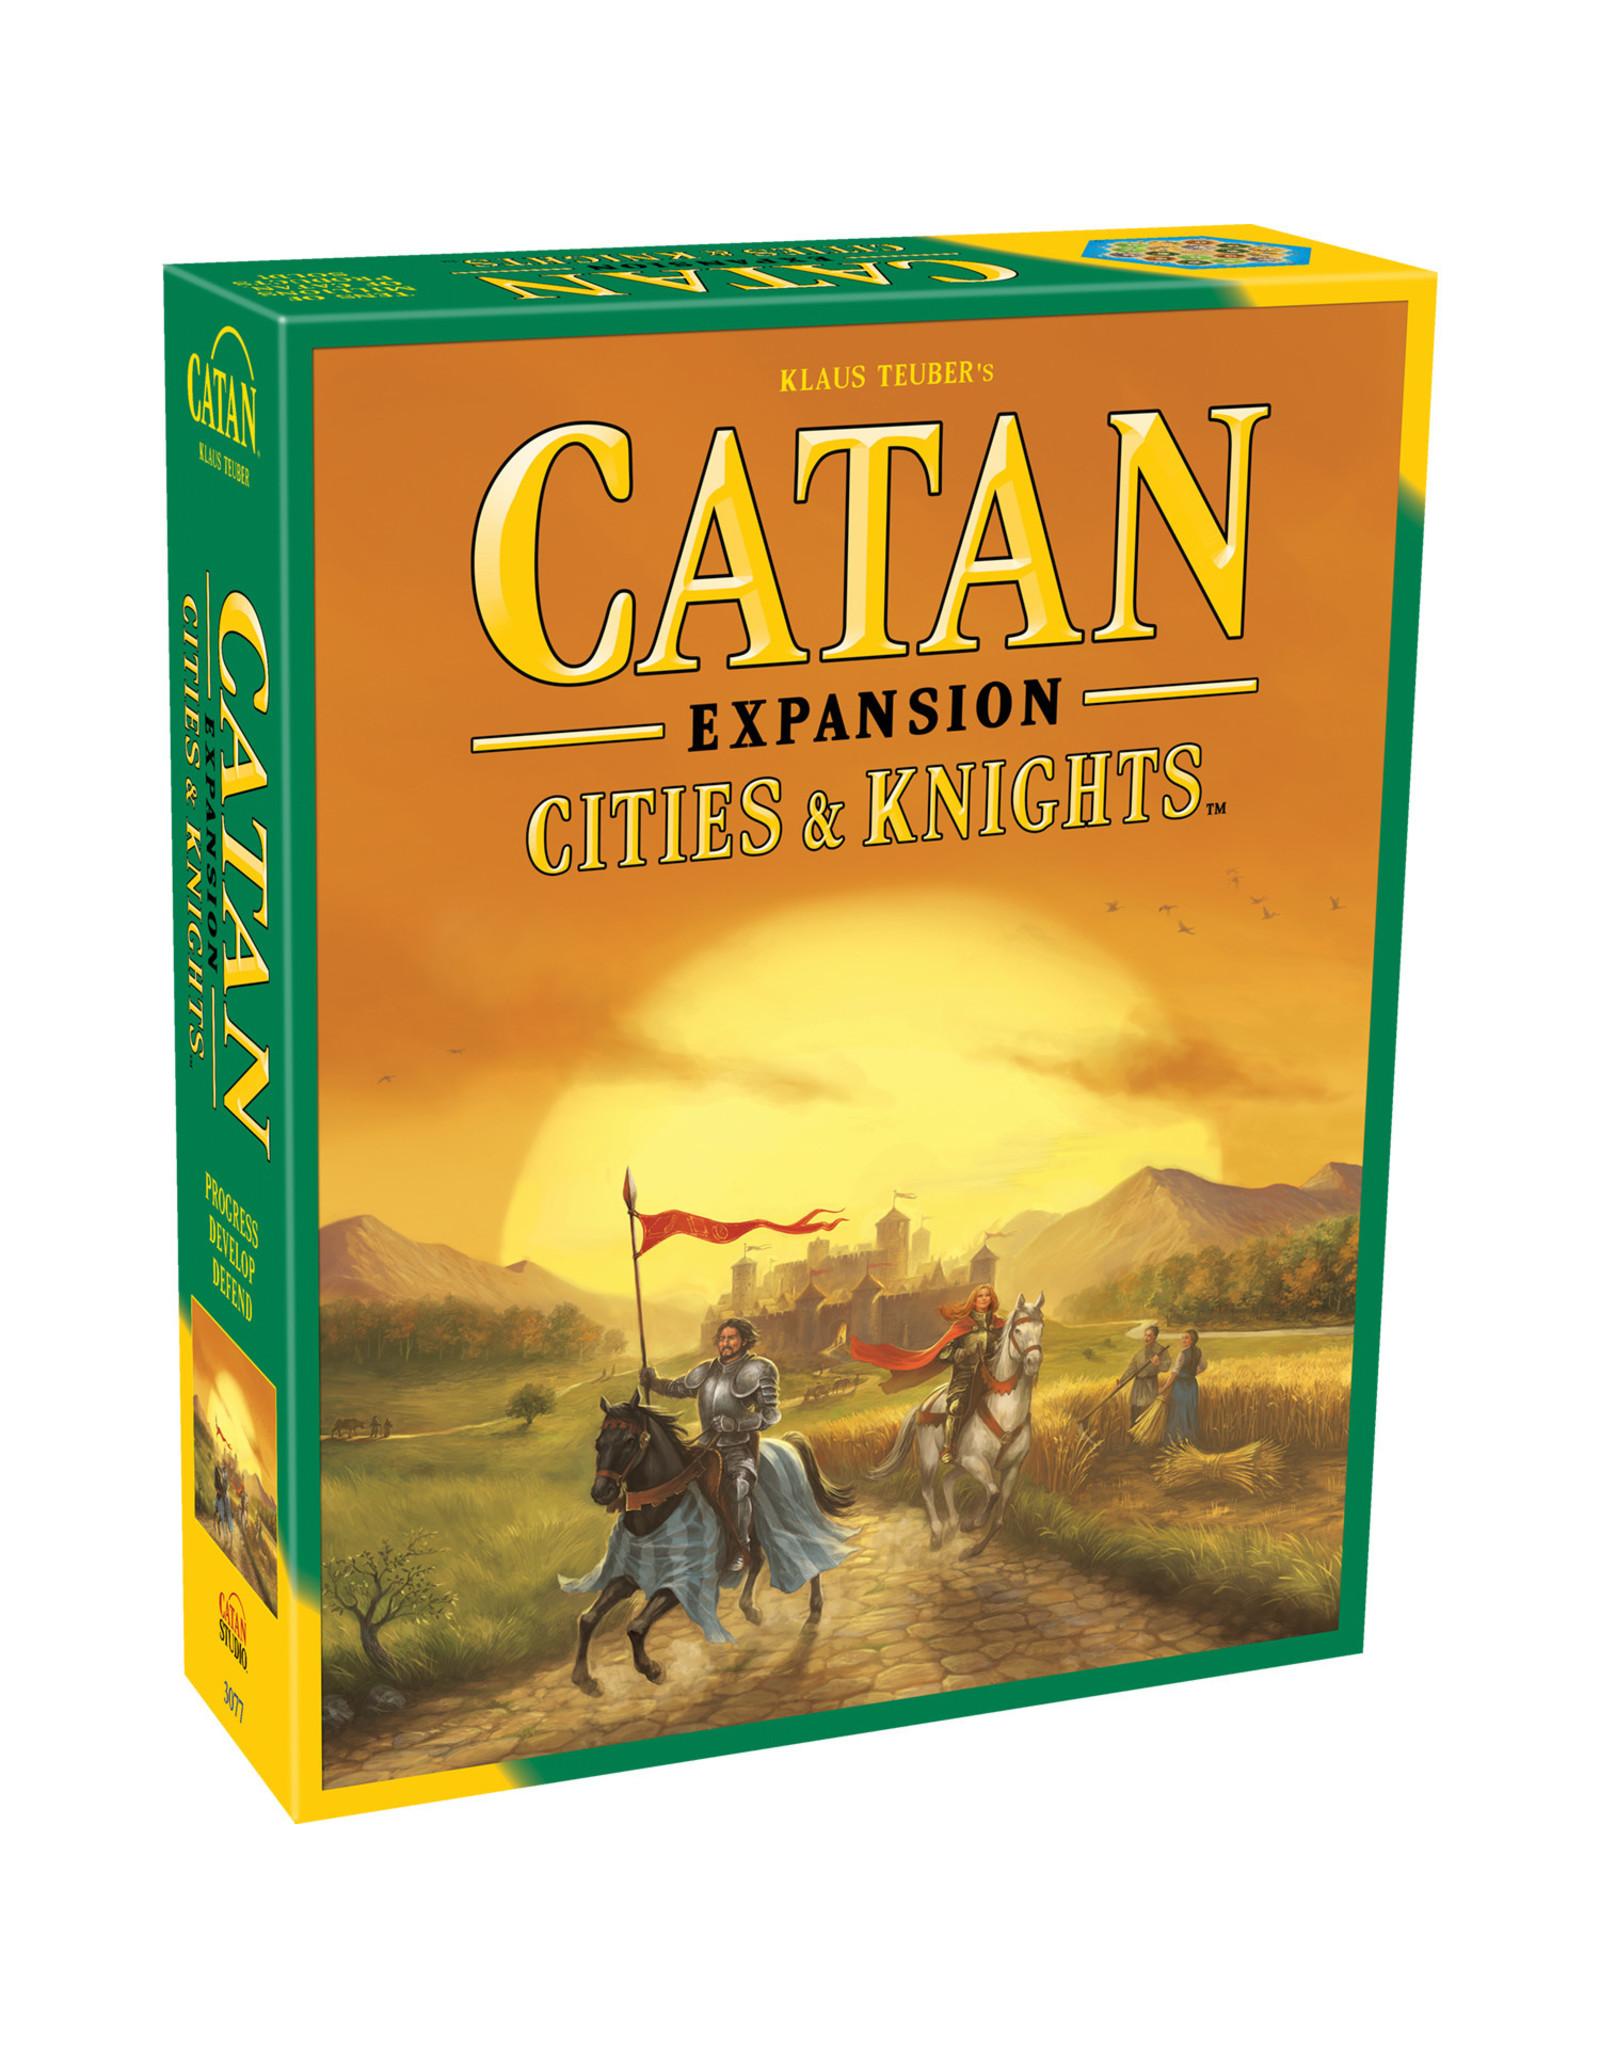 CATAN CATAN EXP: CITIES & KNIGHTS (English)